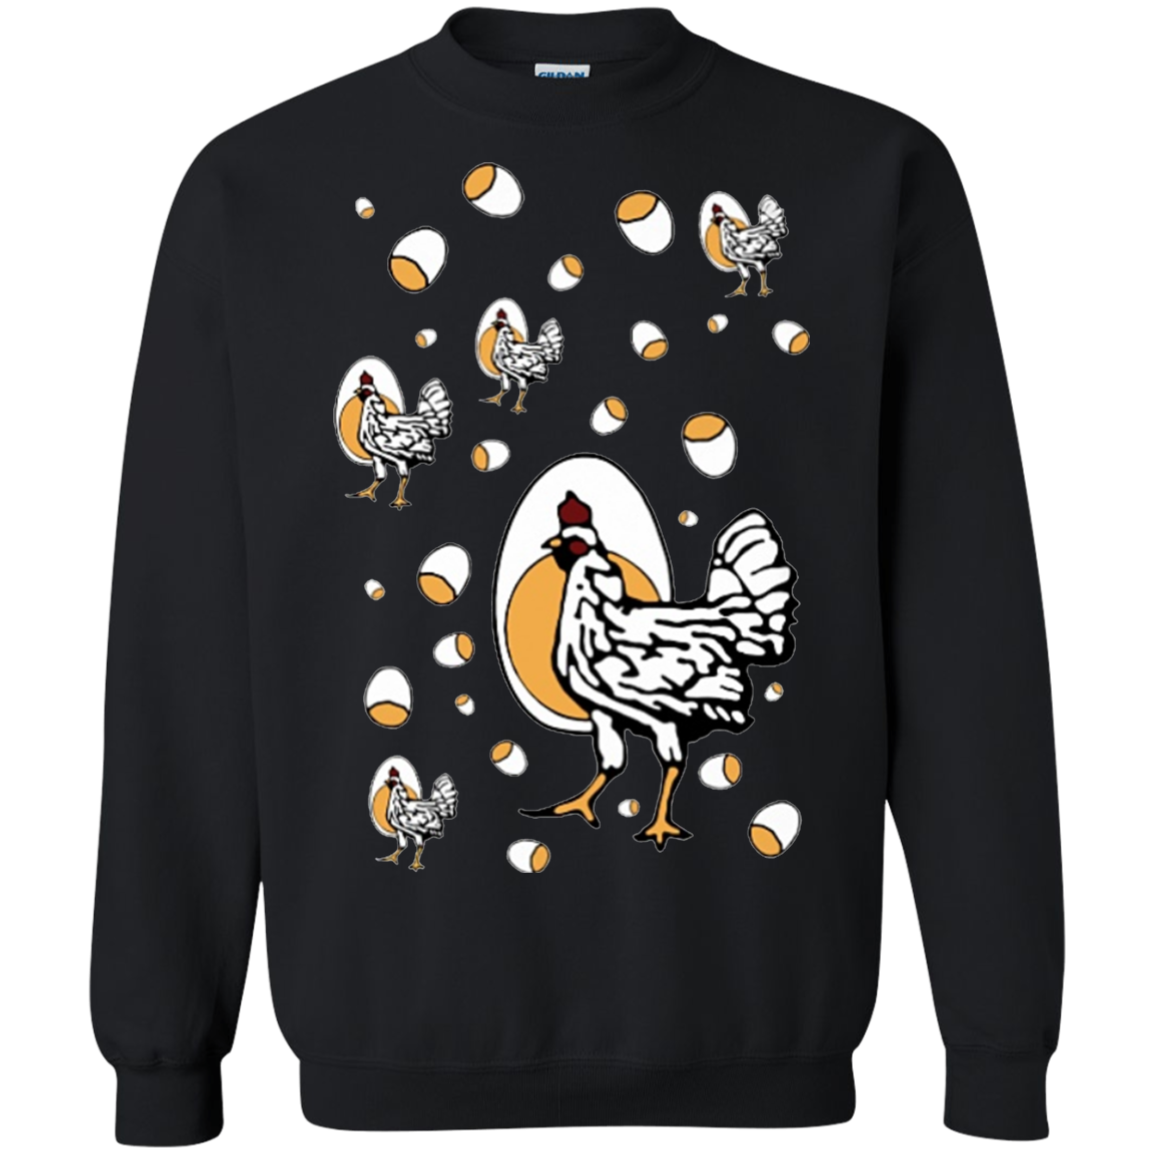 Chicken Shirt Roseanne T shirt Hoodie Sweater SweatShirt